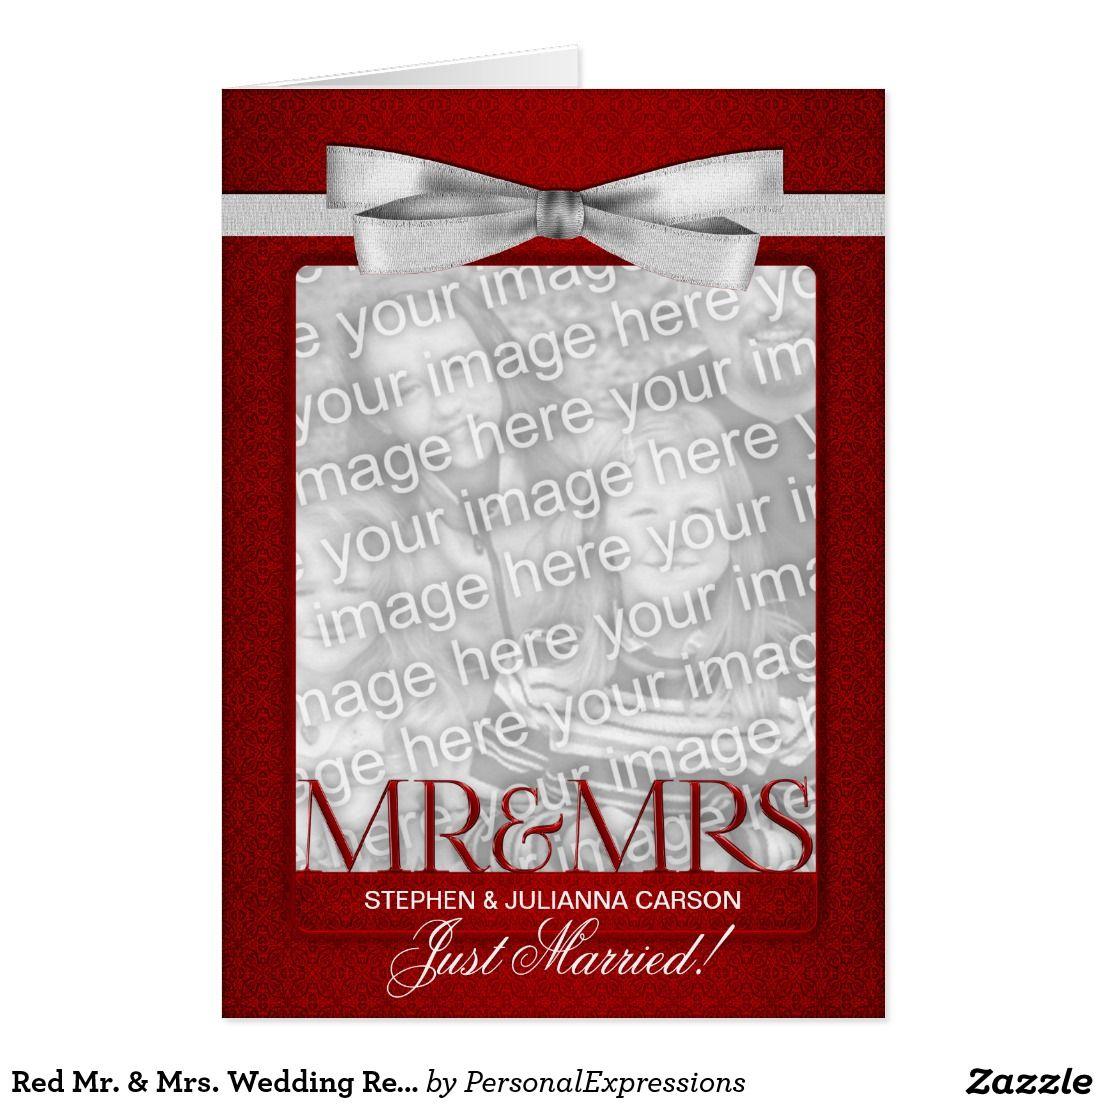 Red Mr. & Mrs. Wedding Reception Photo Invitation | Wedding ...